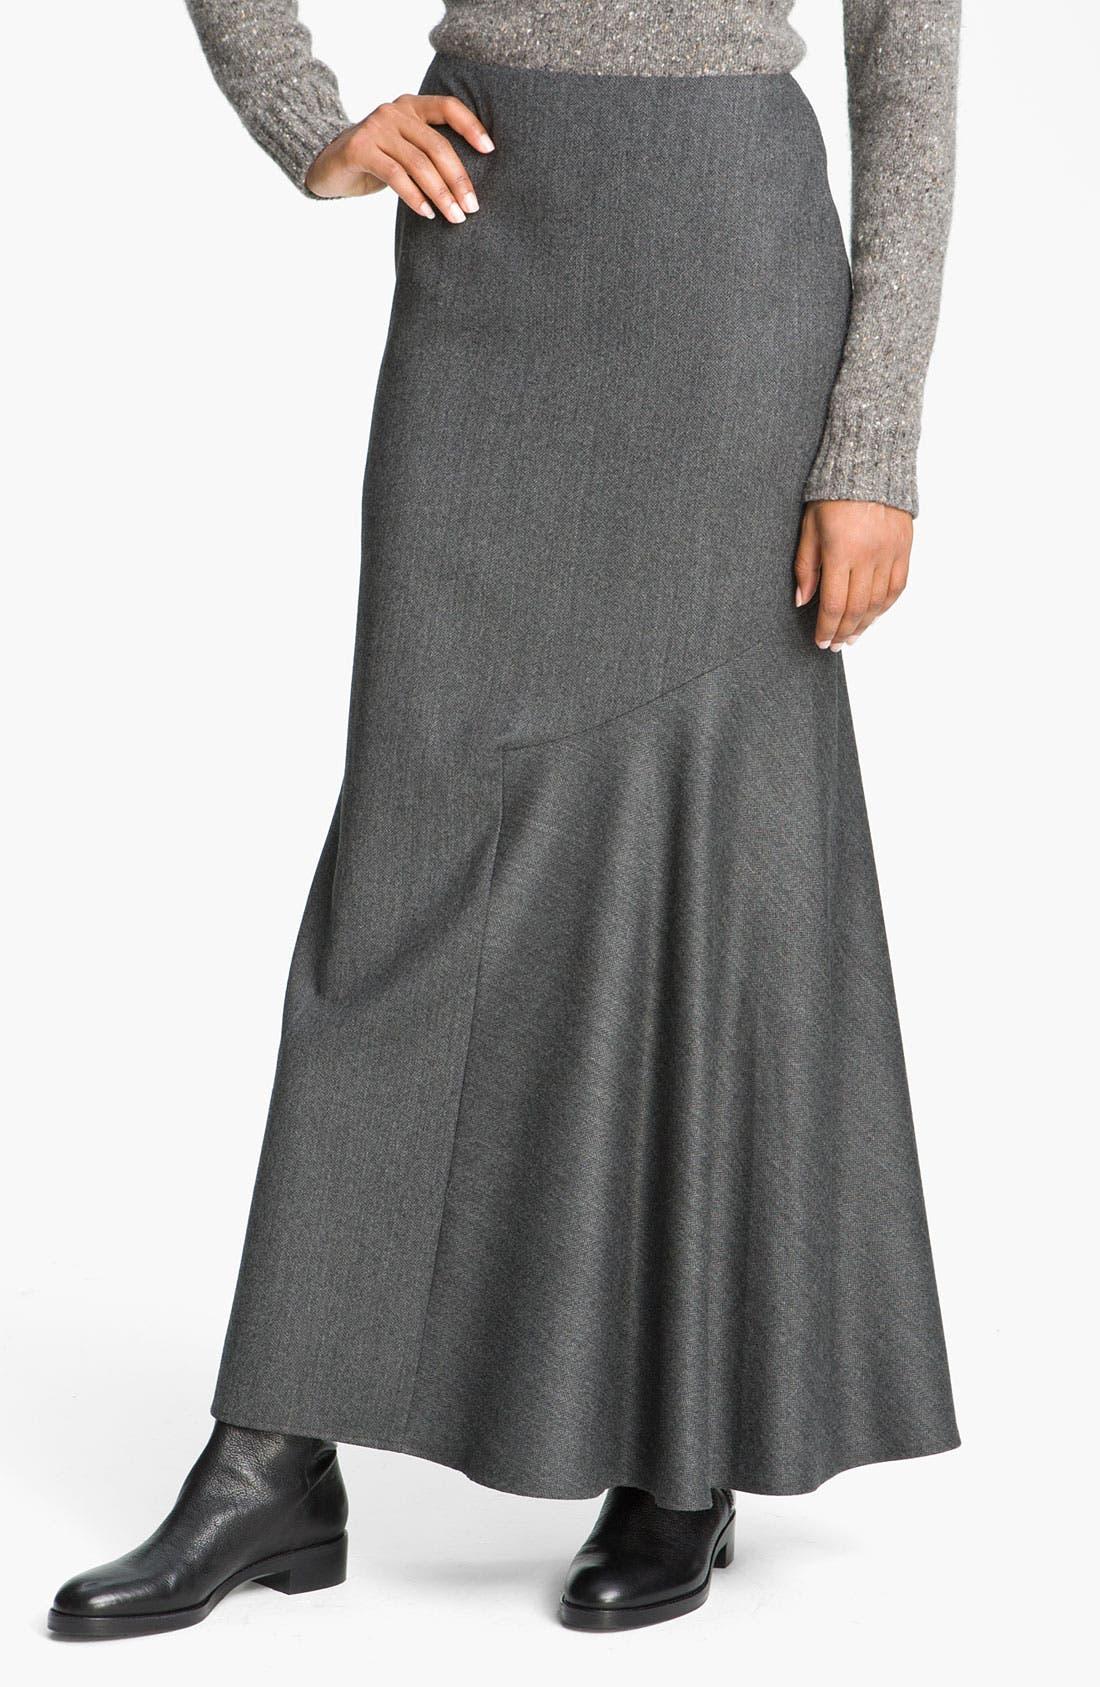 Alternate Image 1 Selected - Weekend Max Mara 'Tanatalo' Maxi Skirt